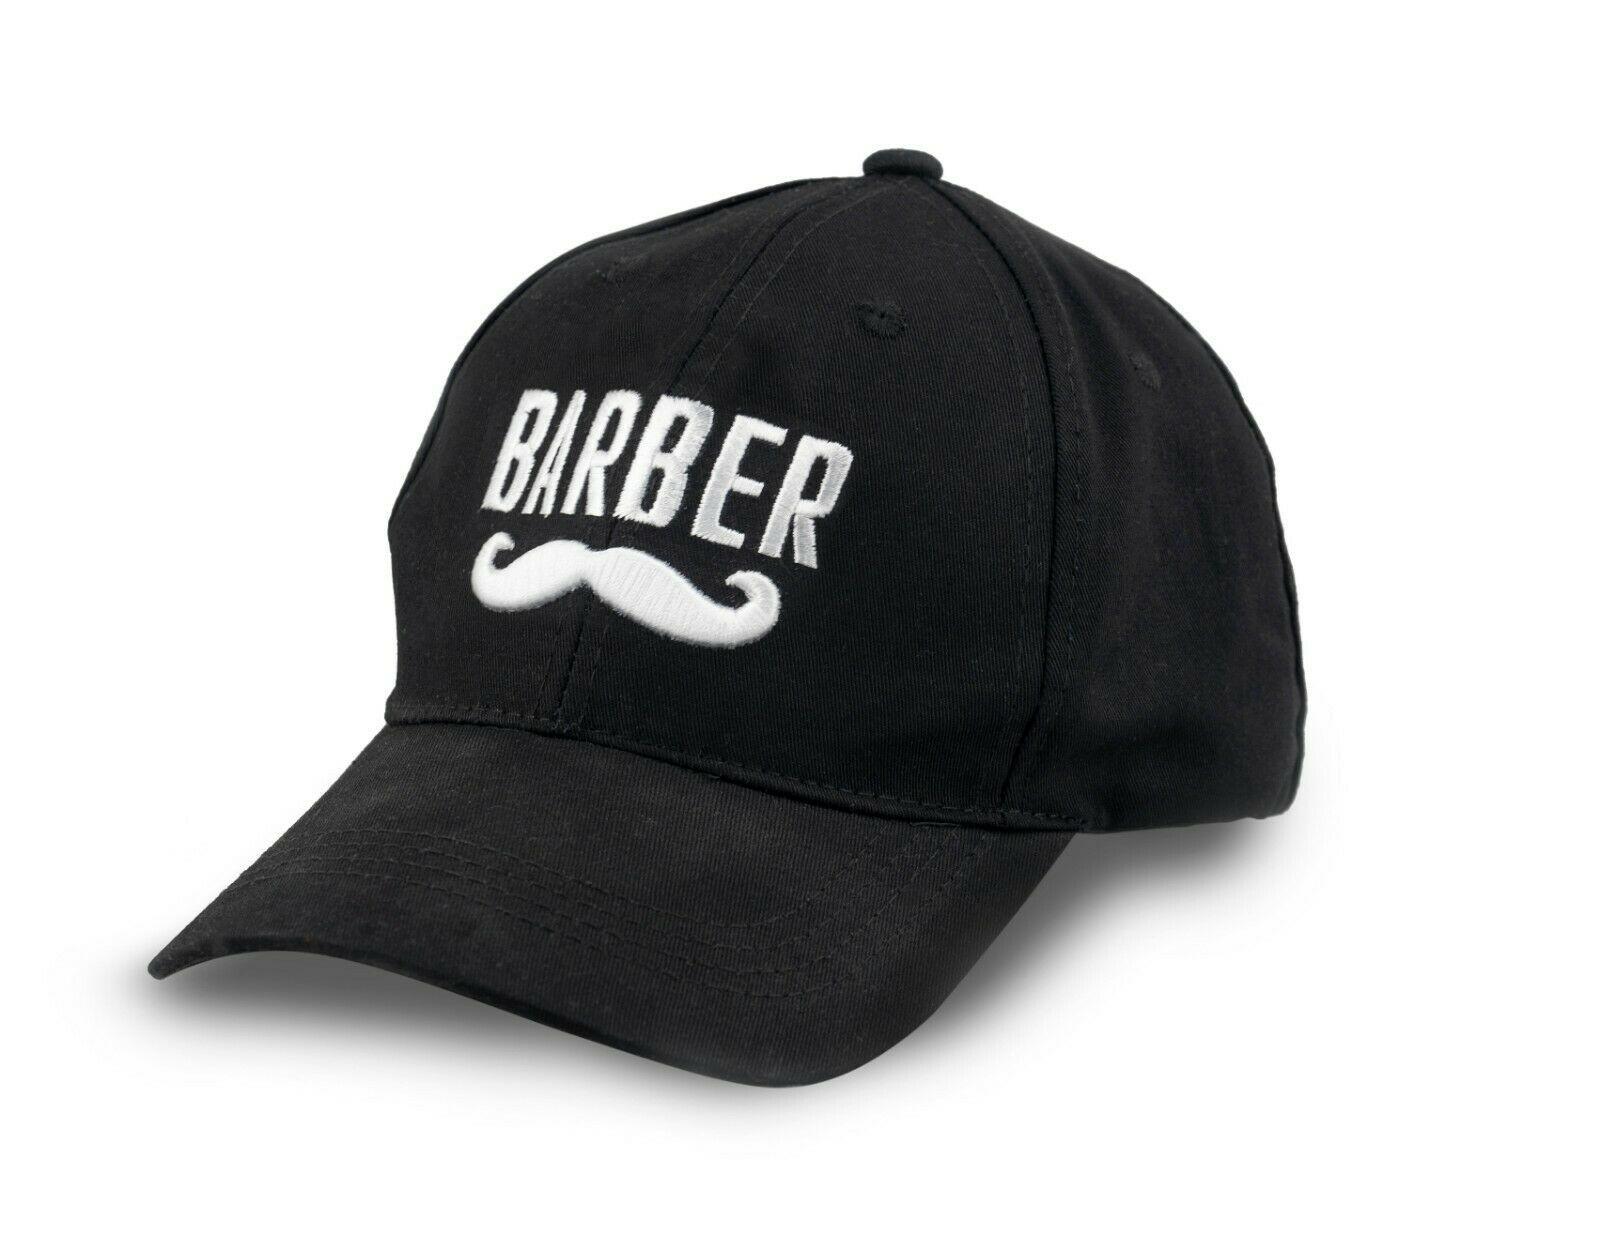 Barber Mustache Logo Embroidered Flexfit Baseball Hat